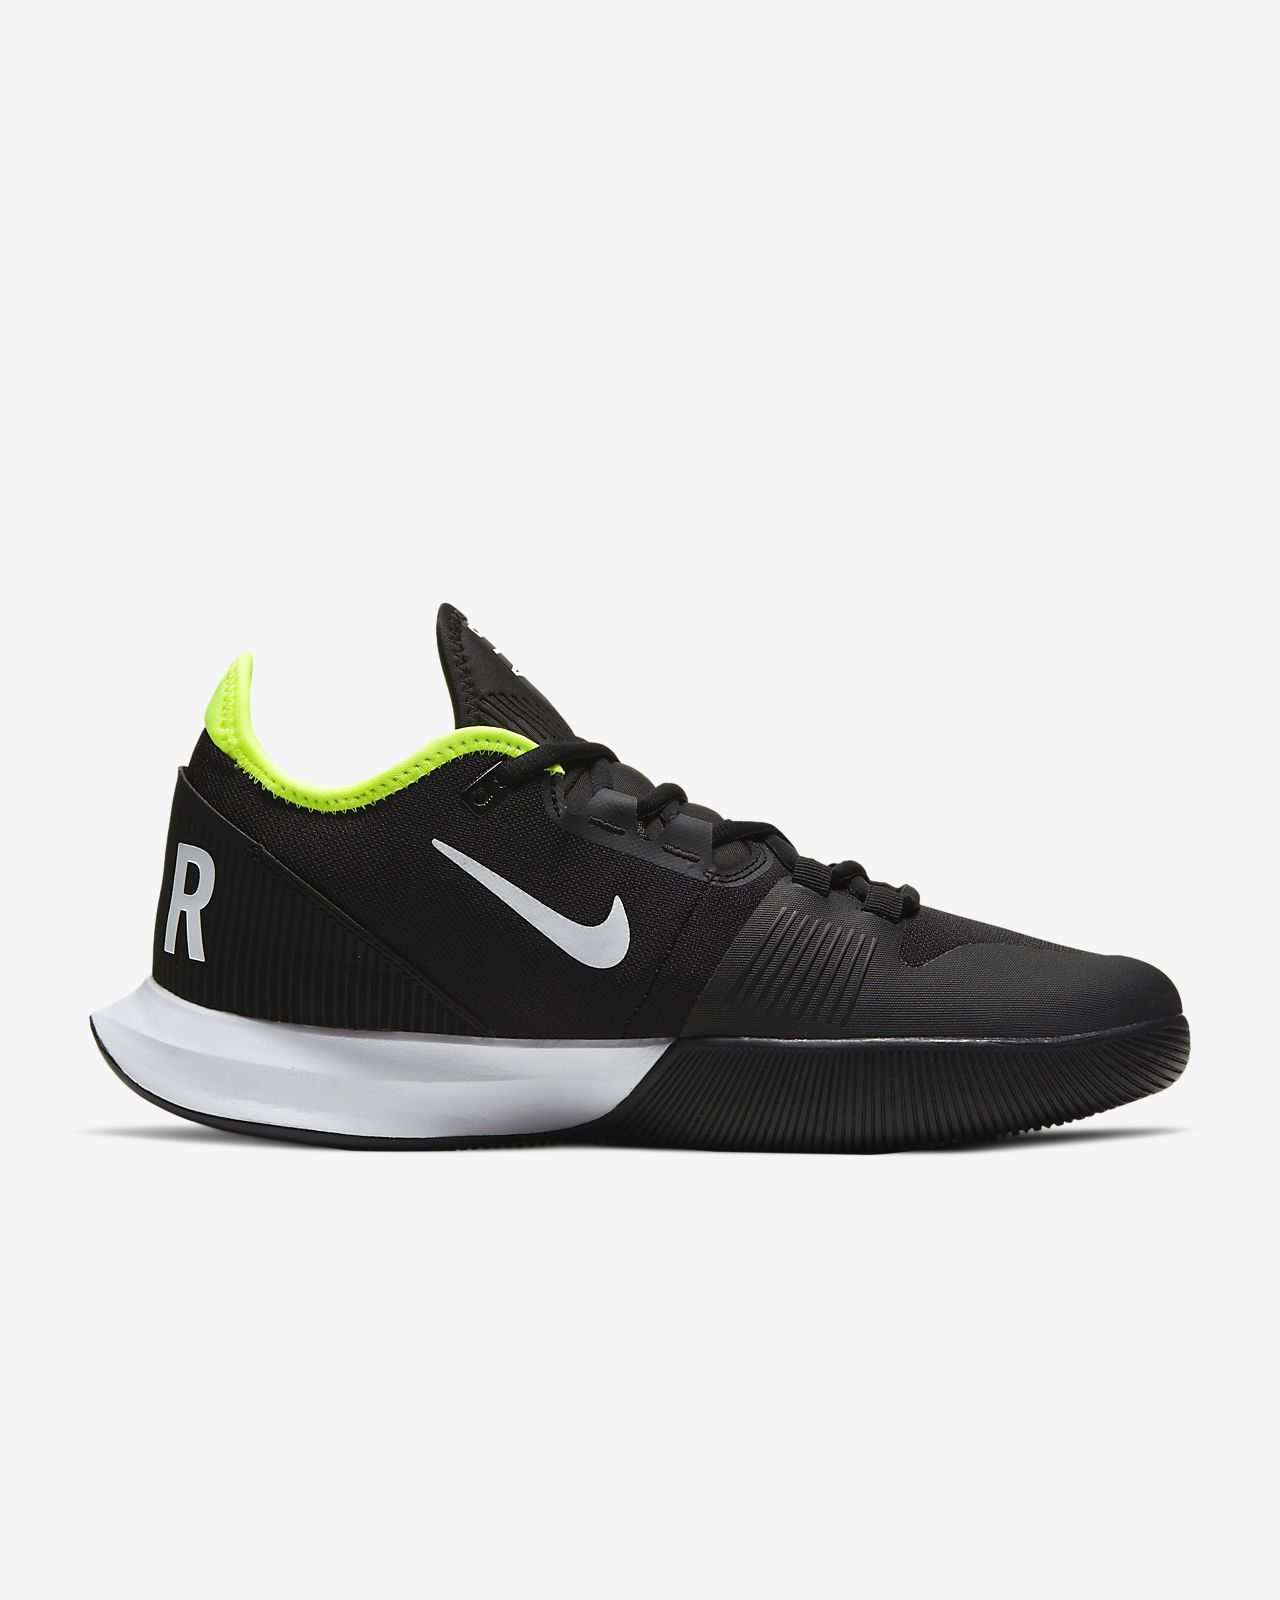 Scarpe da Calcio Nike Online Prezzi Bassi,Nike Court Air